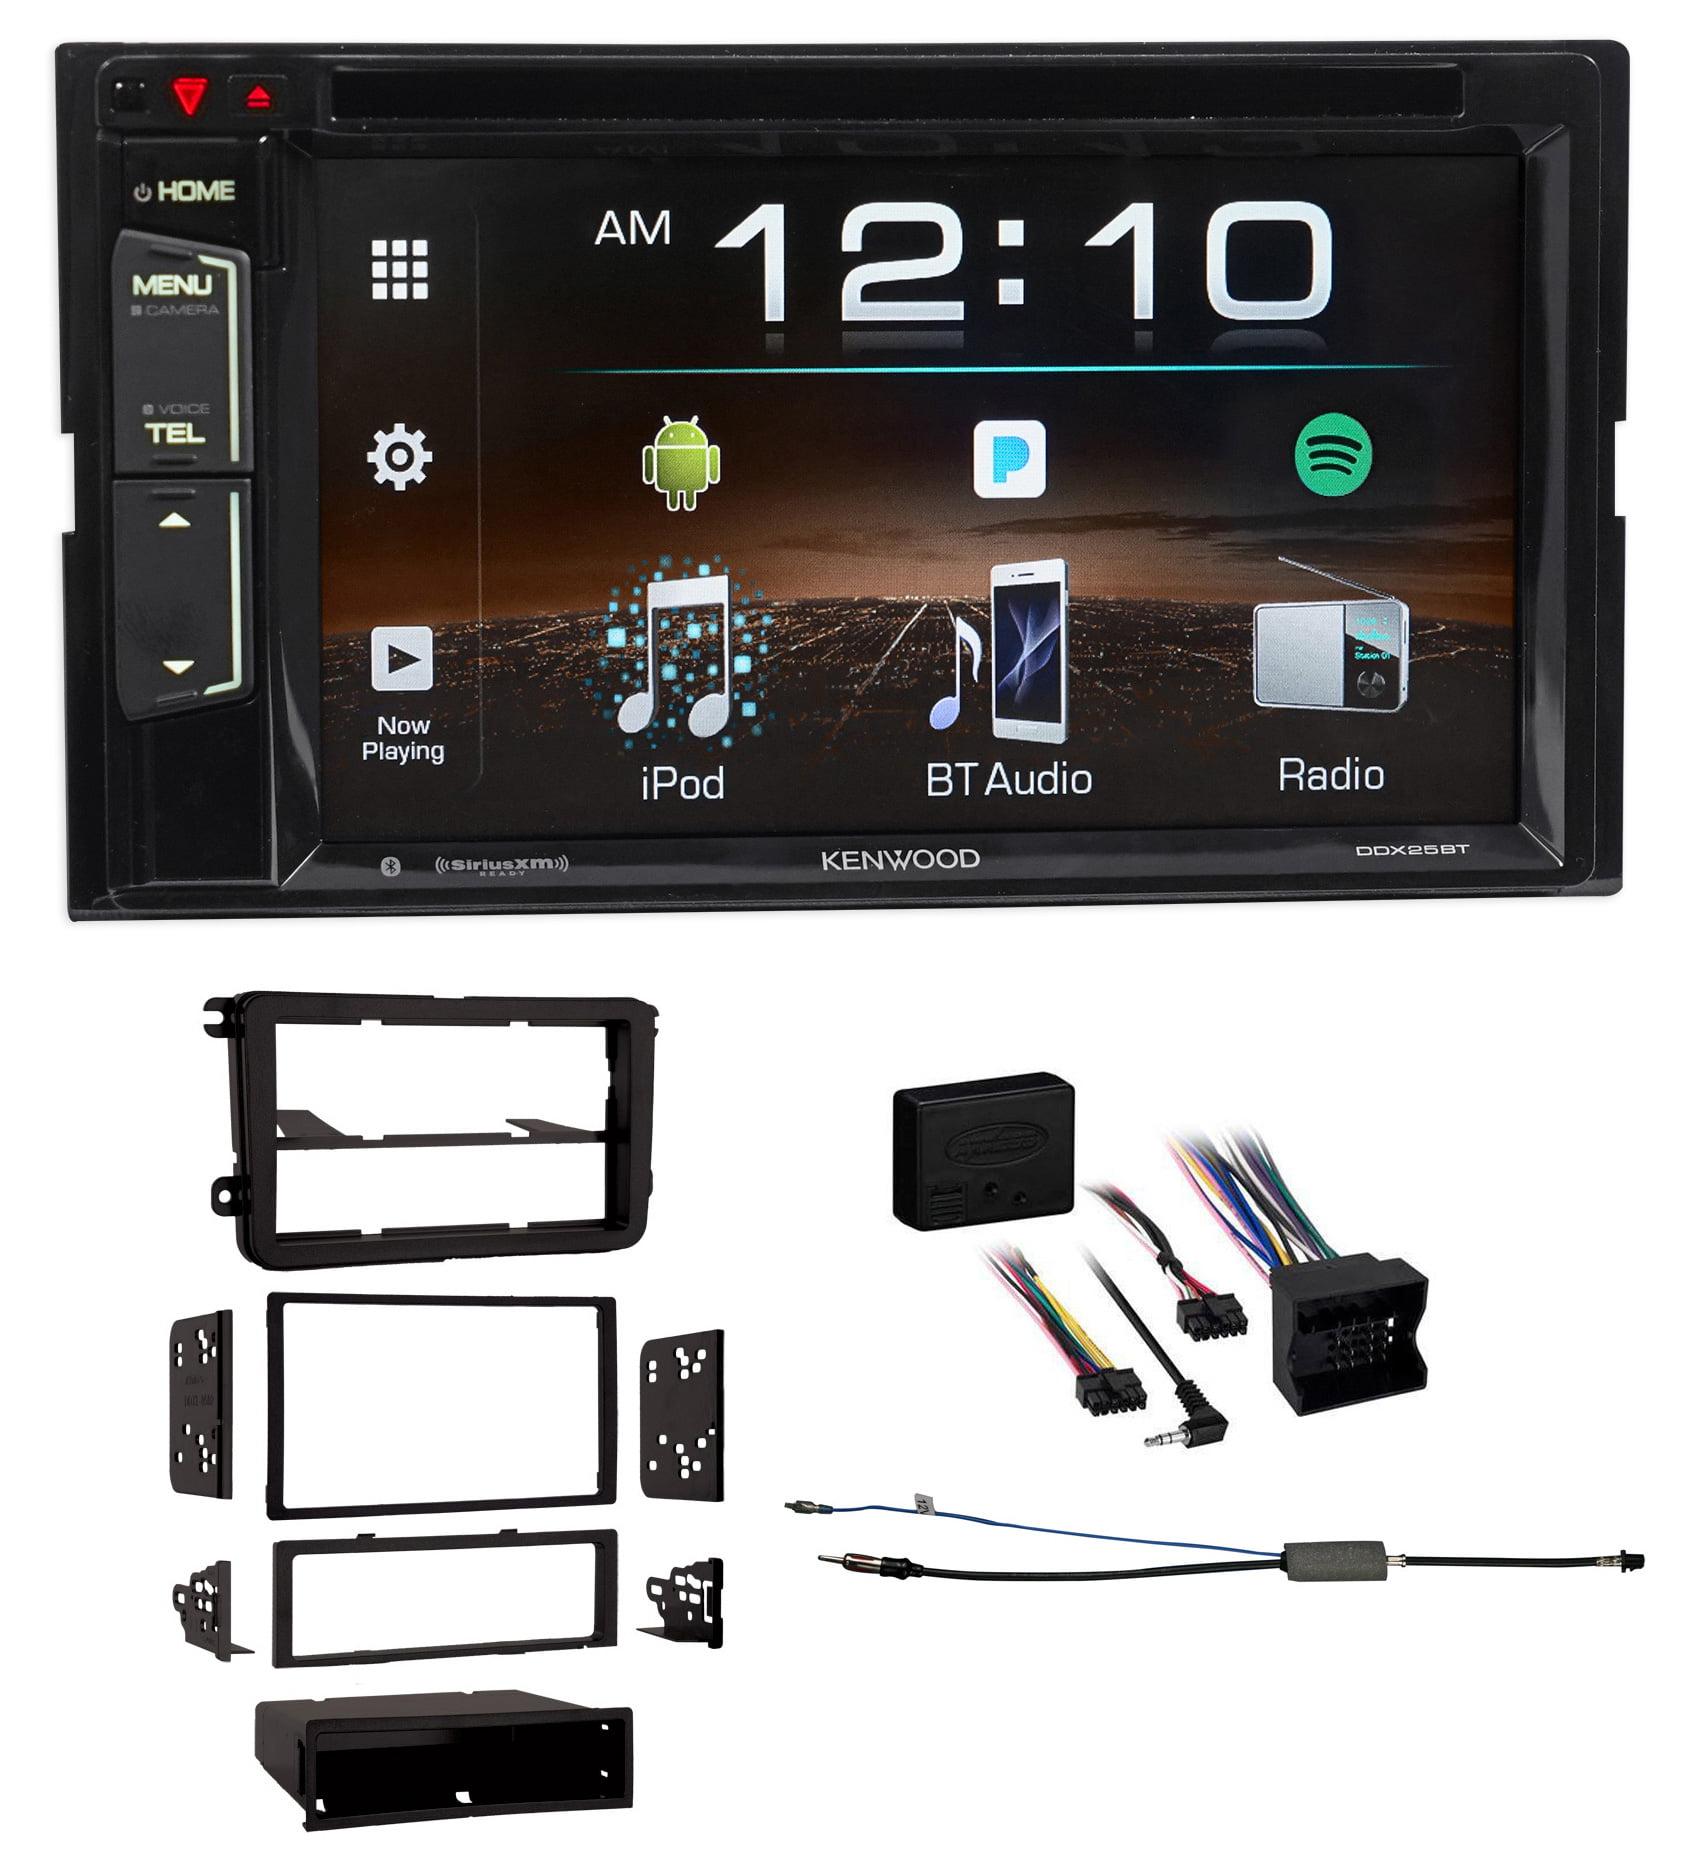 Kenwood DVD iPhone Bluetooth Pandora USB Receiver For 2008-11 Volkswagen Gli VW by Kenwood